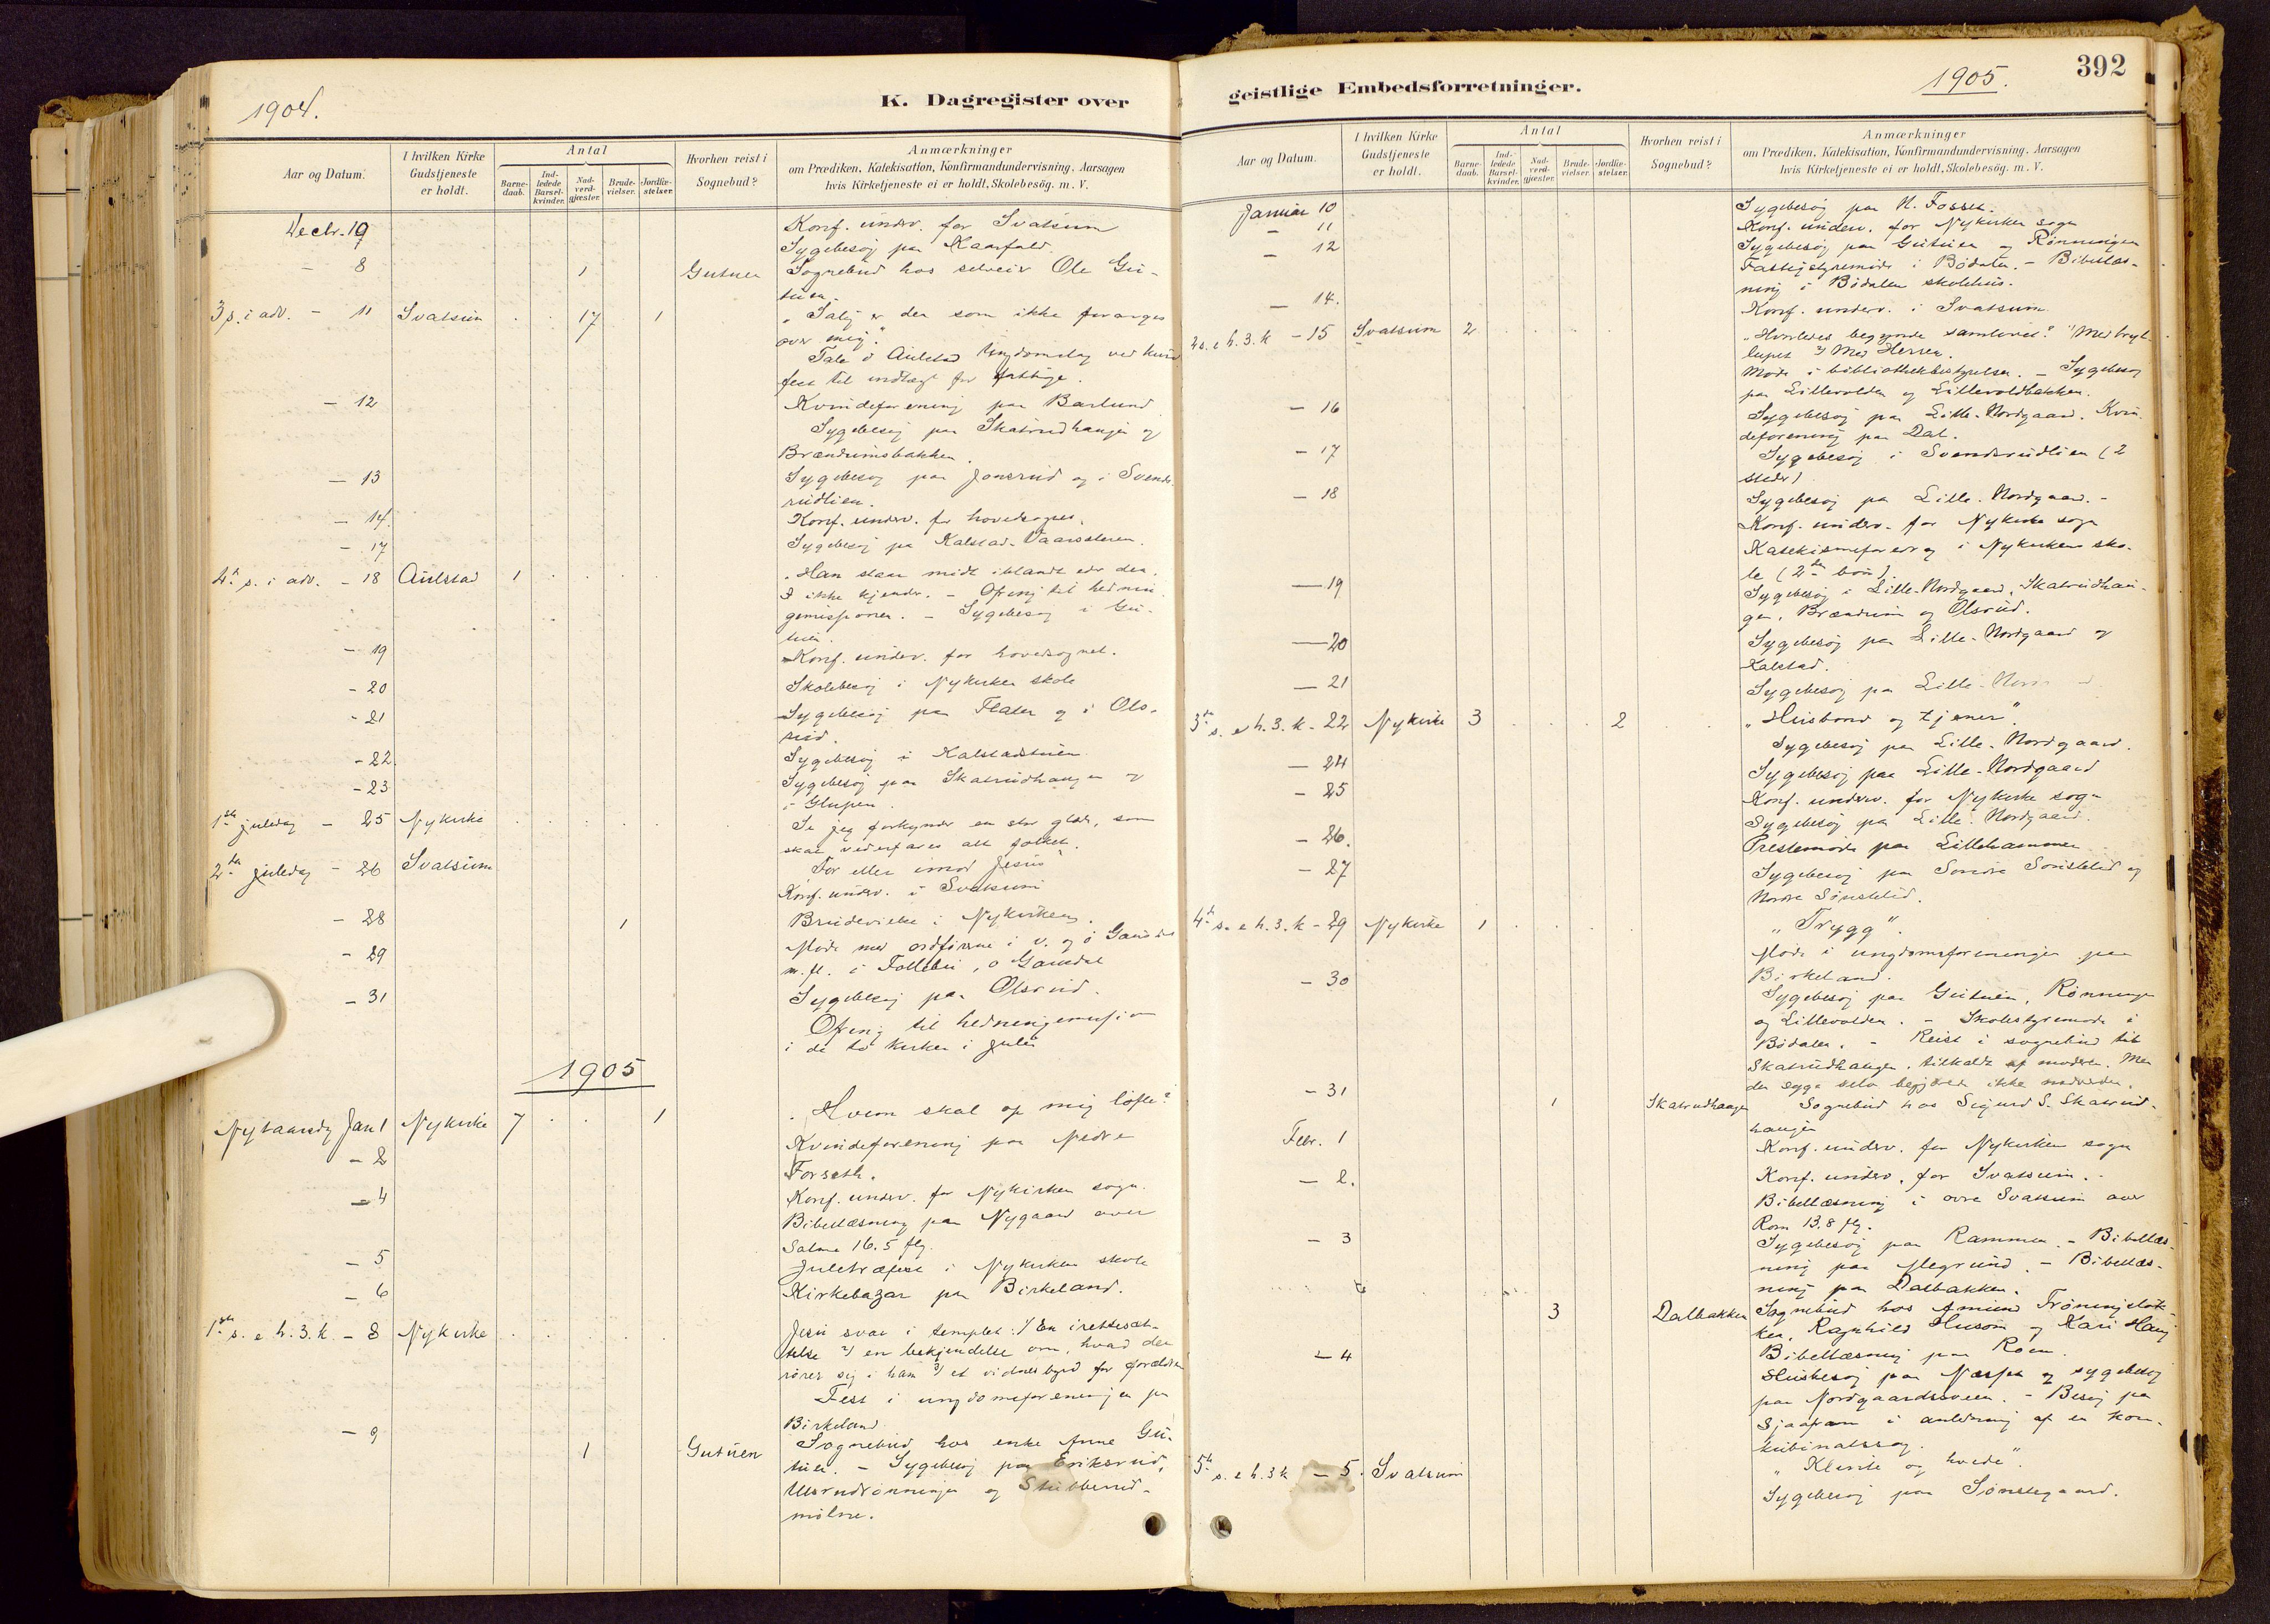 SAH, Vestre Gausdal prestekontor, Ministerialbok nr. 1, 1887-1914, s. 392